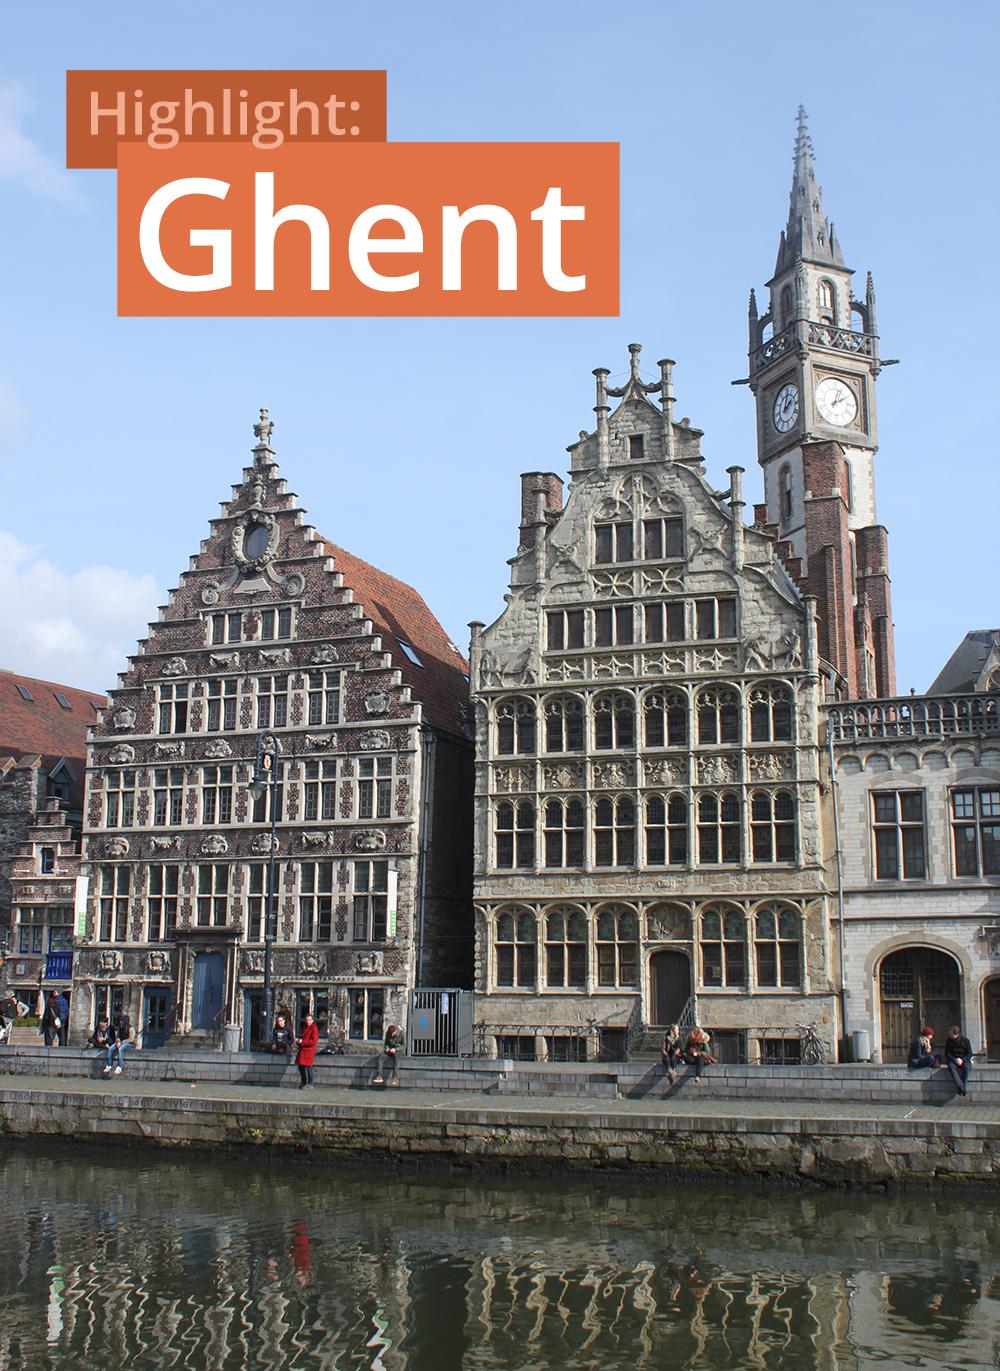 Highlight: Ghent